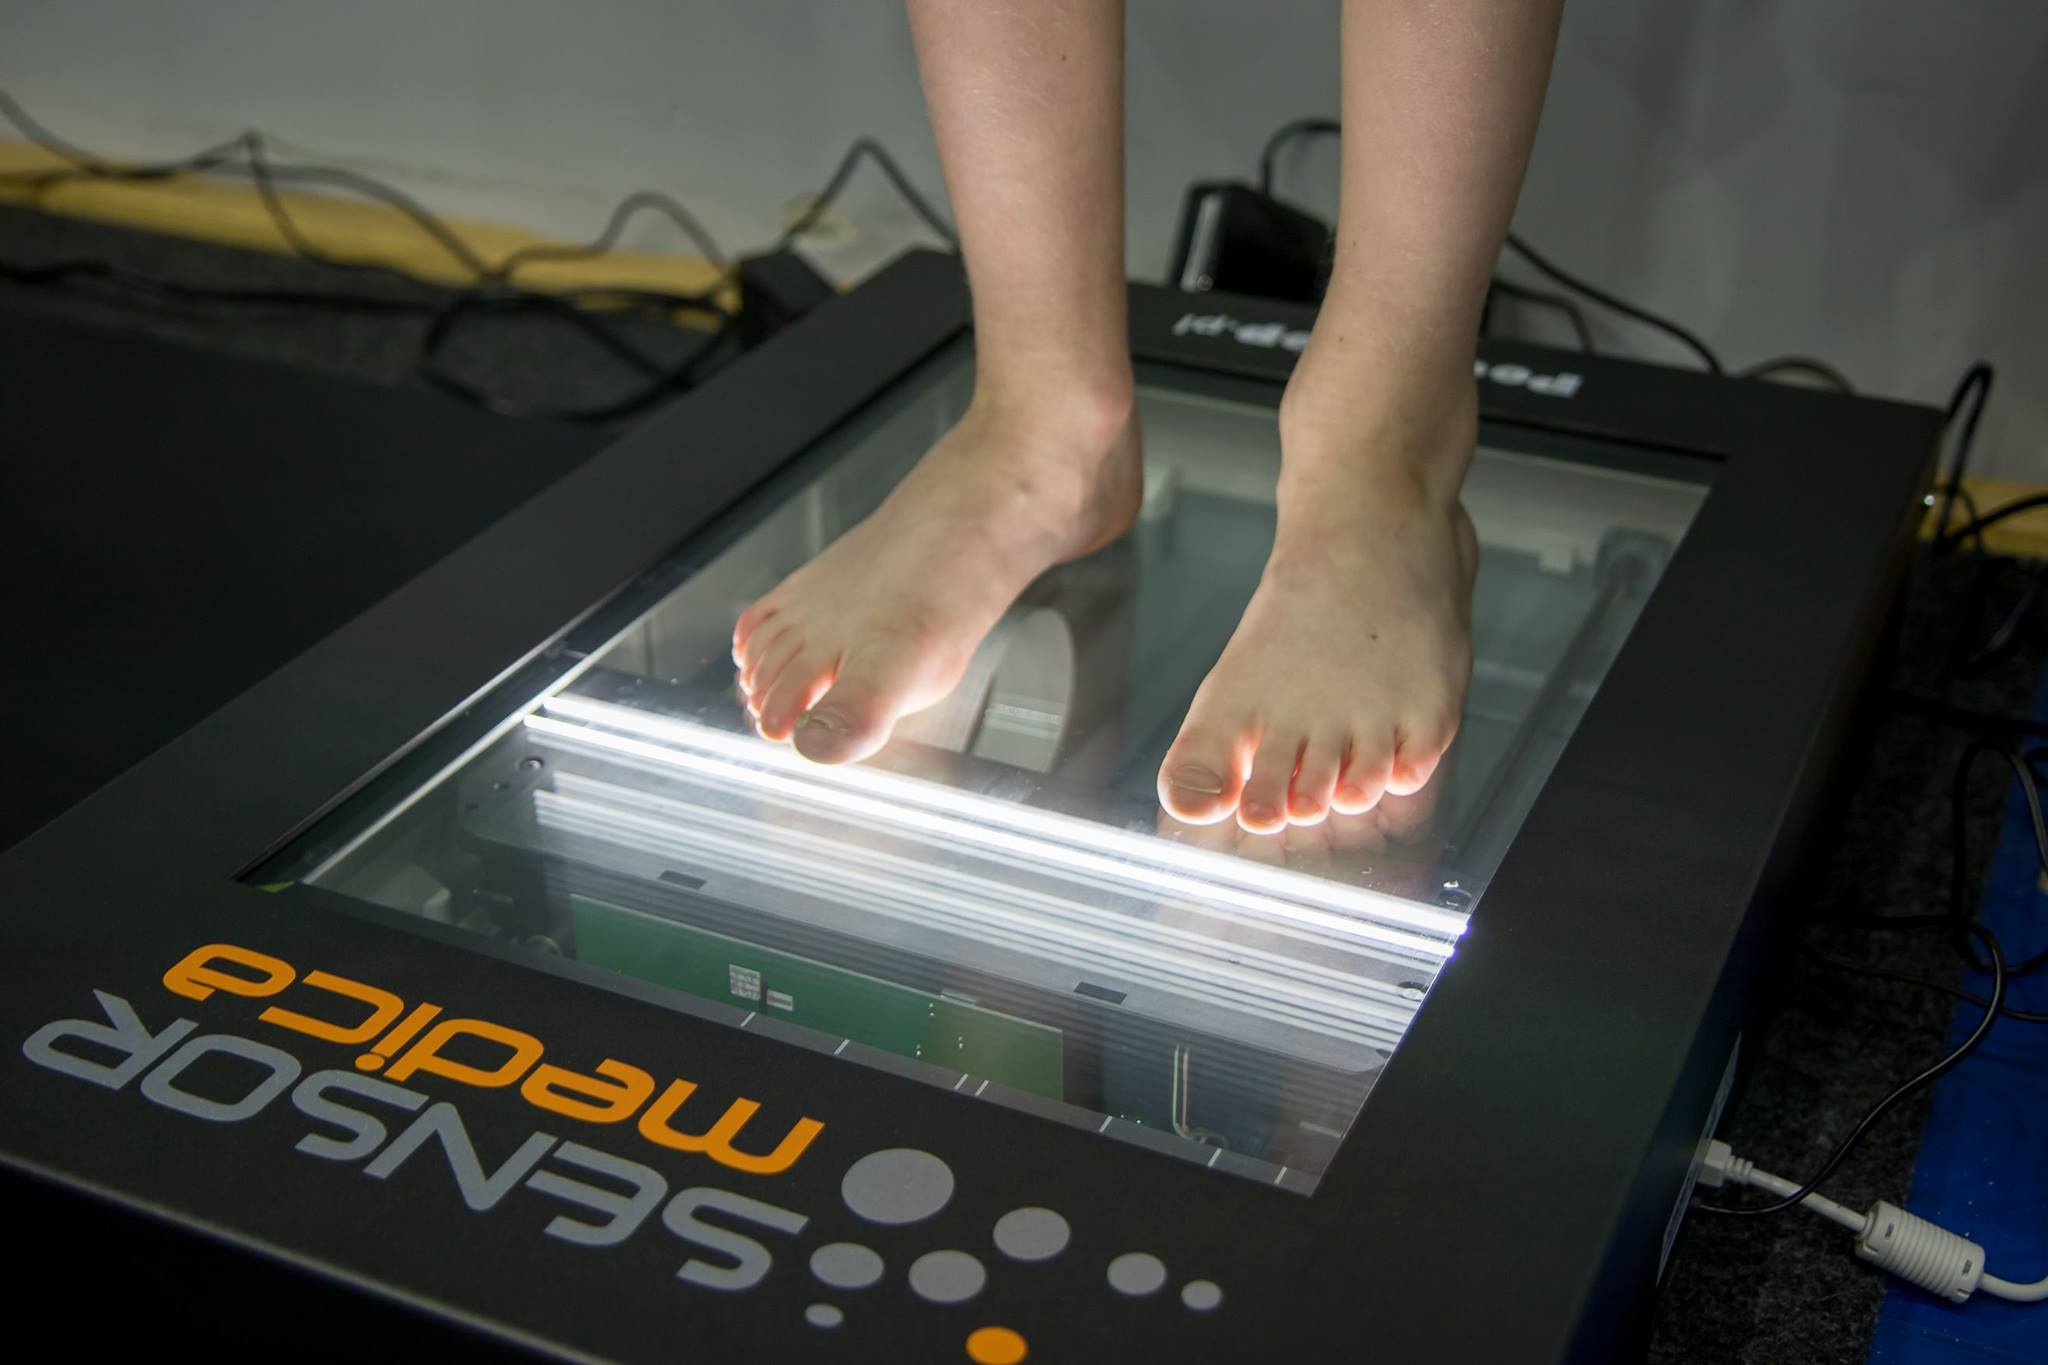 Podoscan 2D - komputerowy podoskop